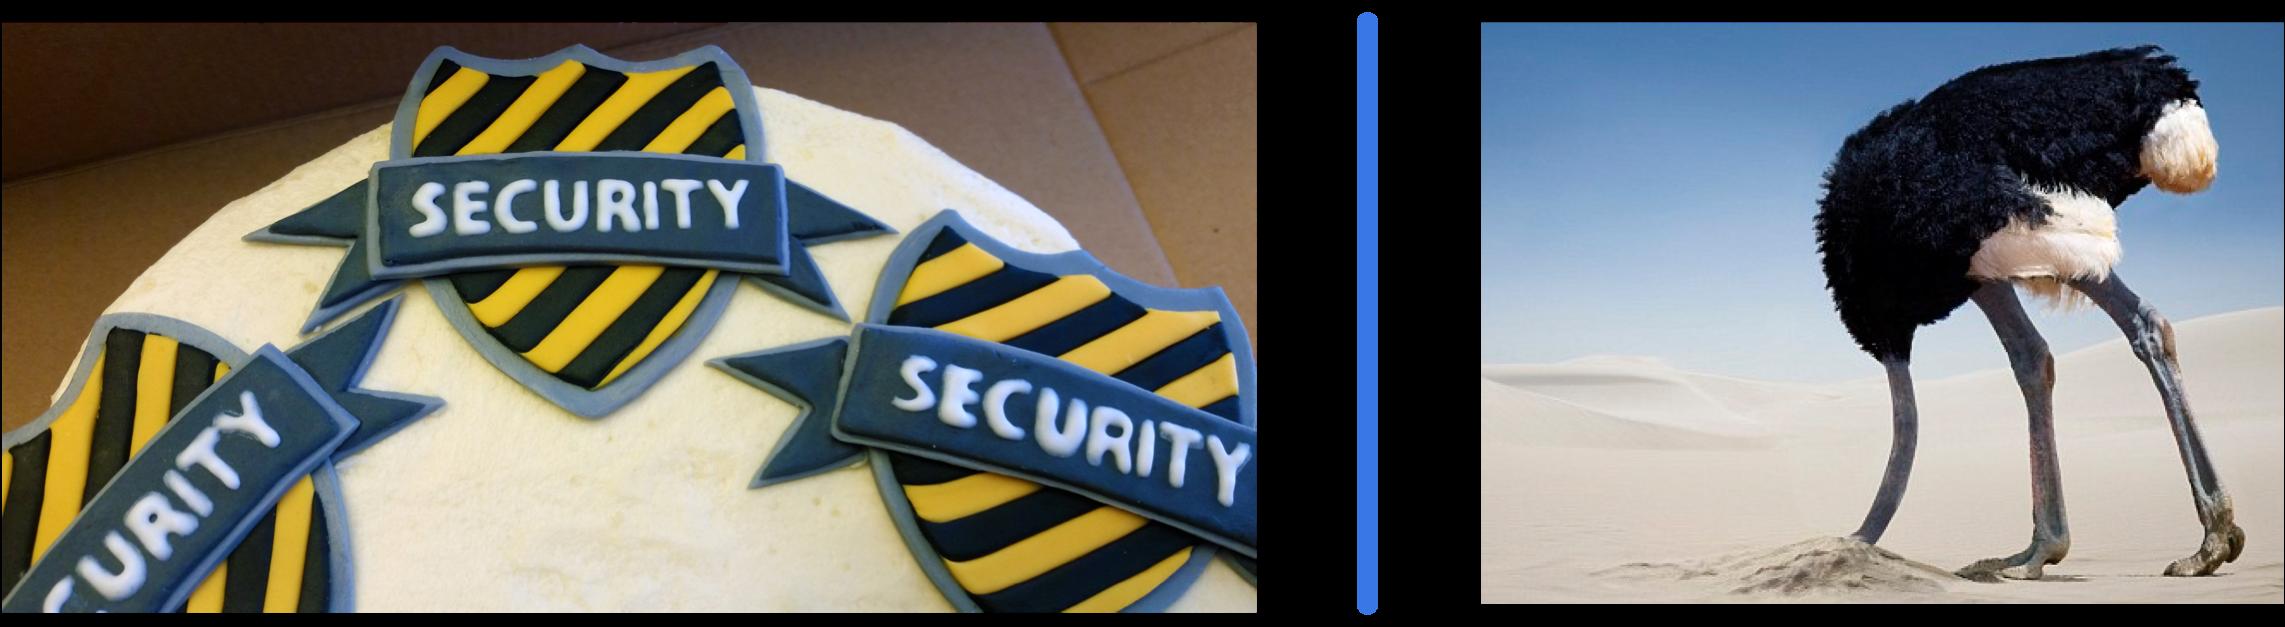 Security Cake